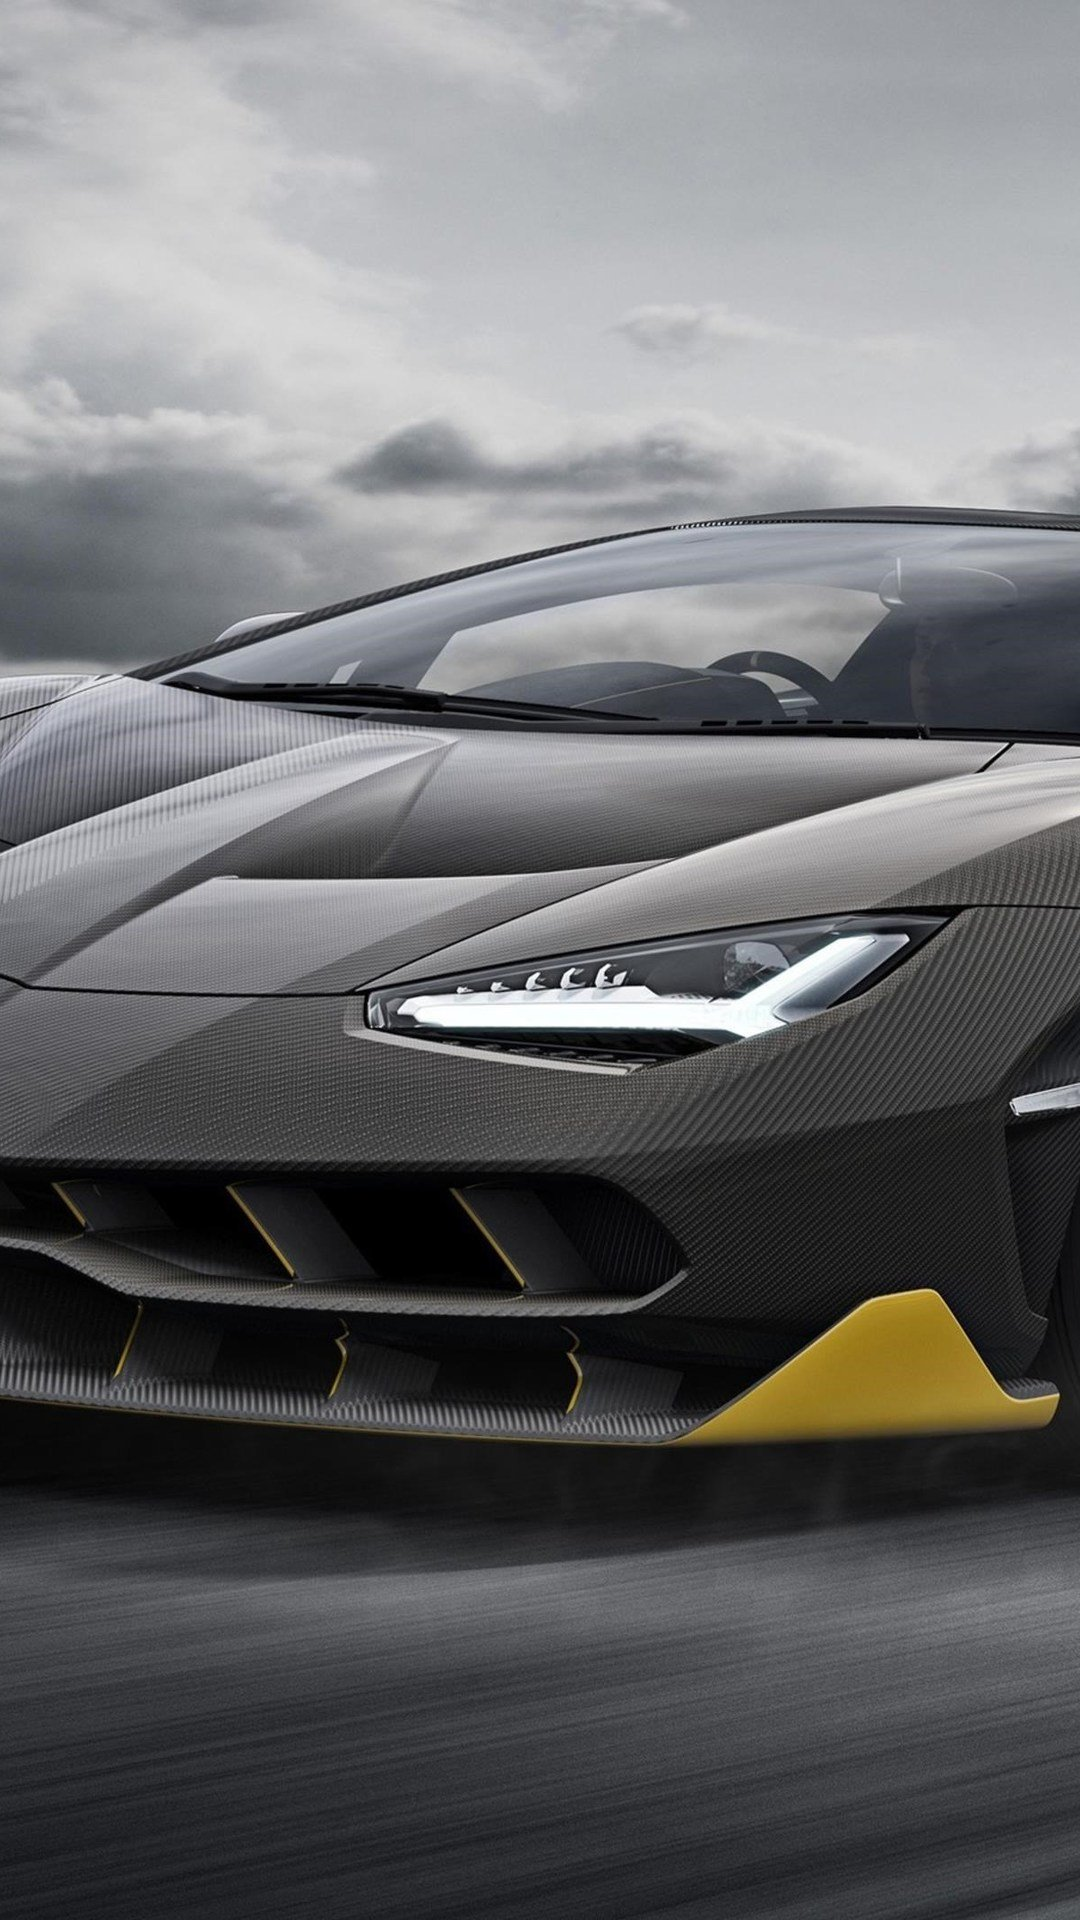 Lamborghini Cell iPhone xs wallpaper